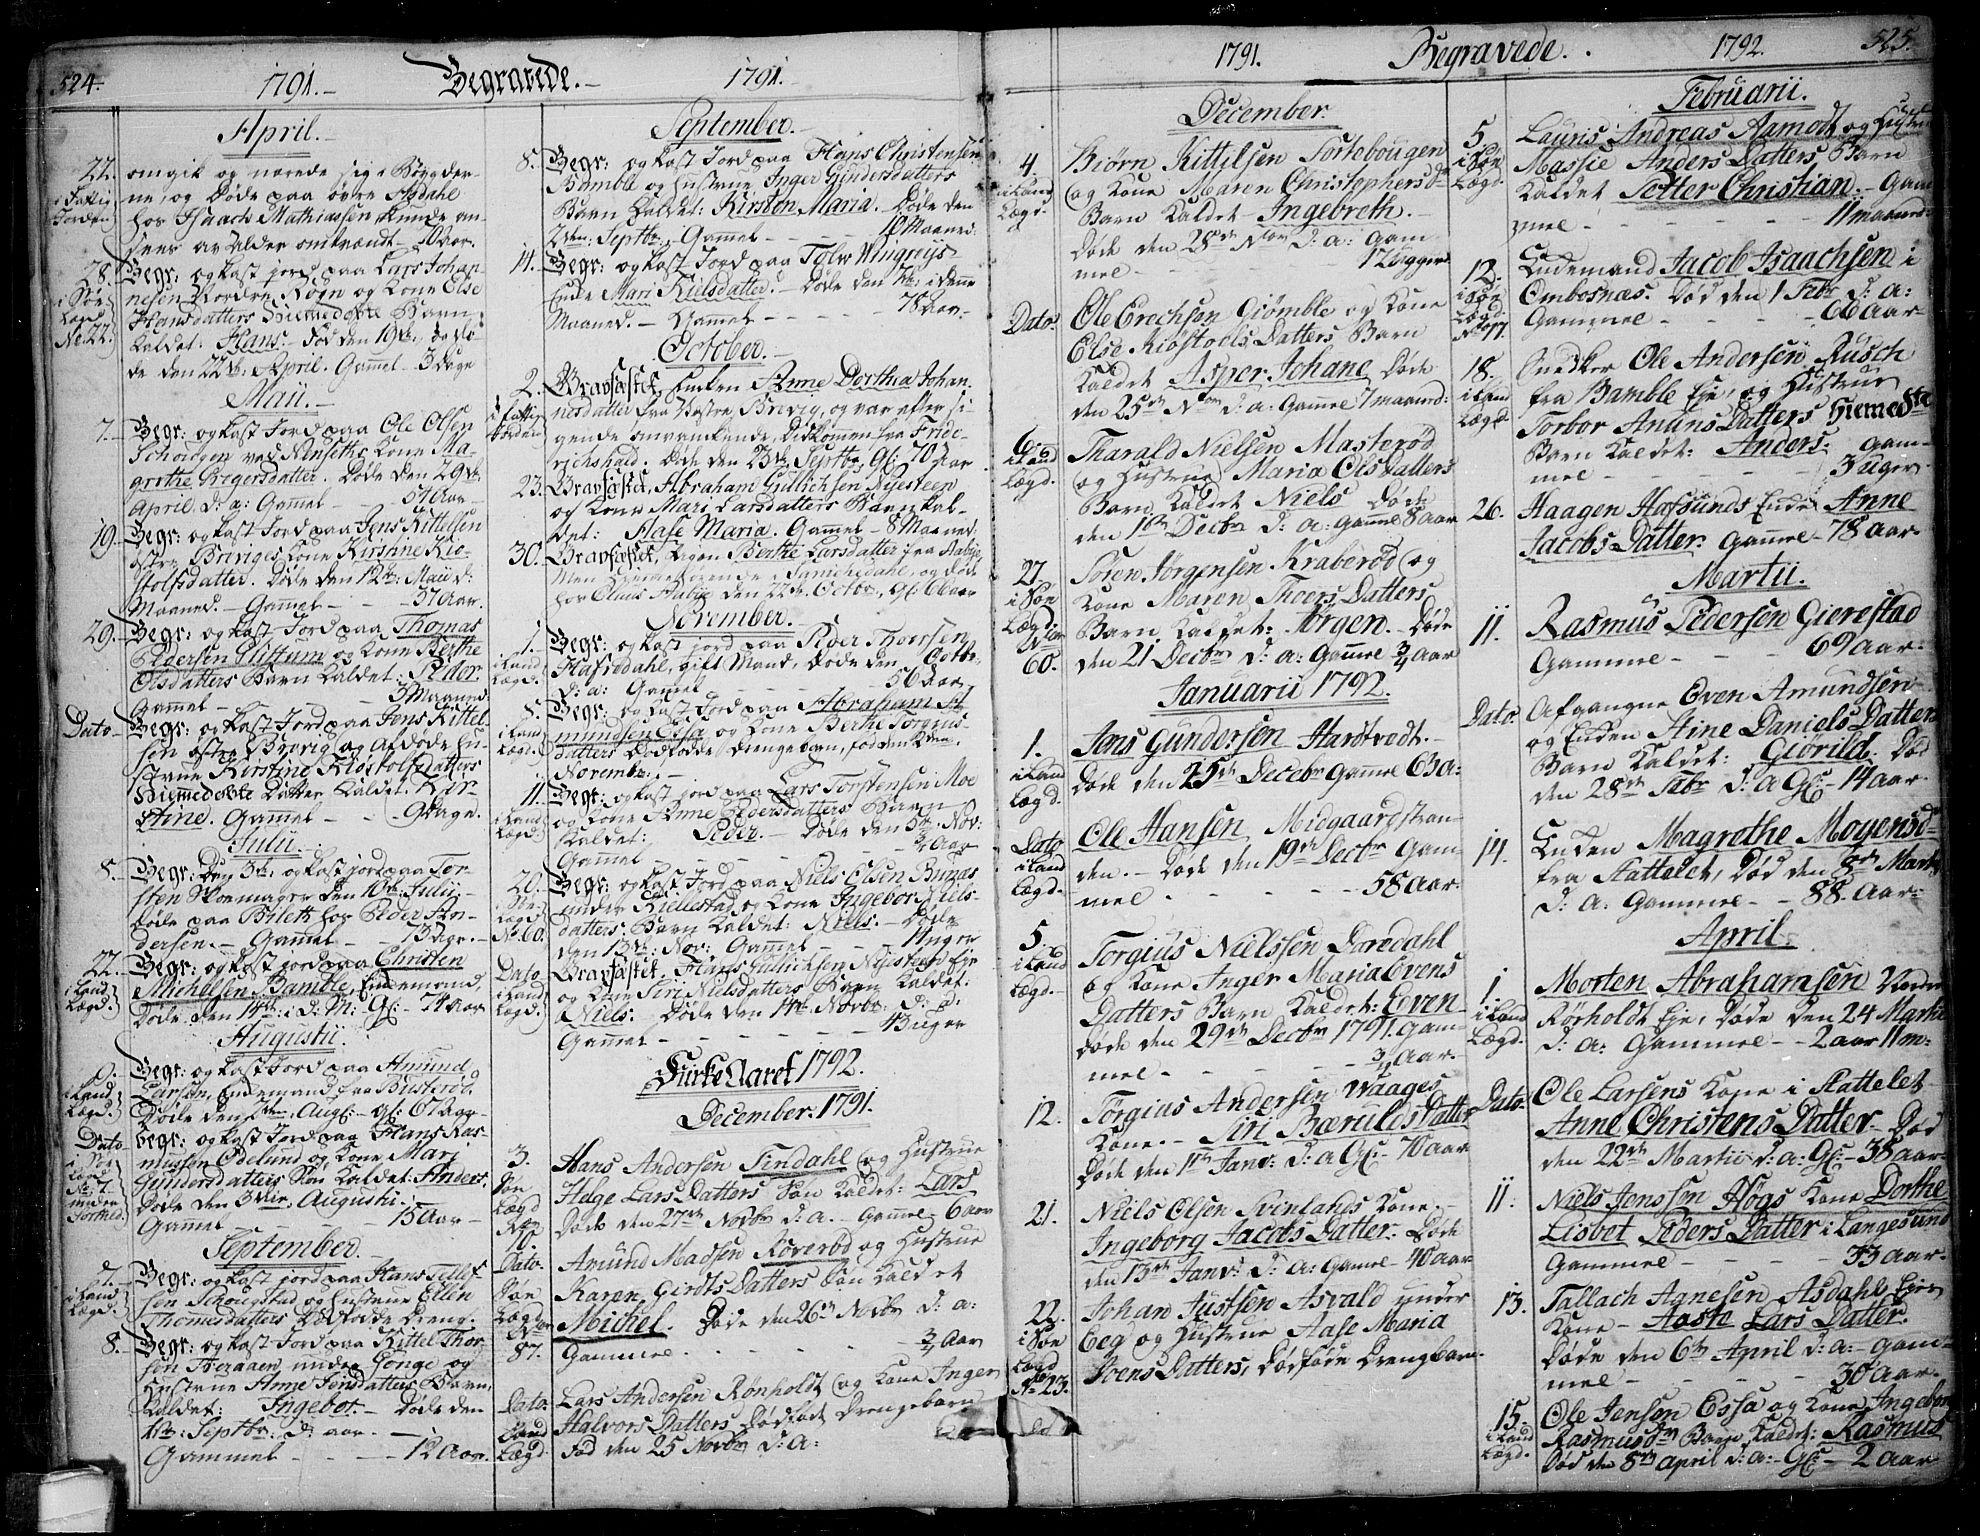 SAKO, Bamble kirkebøker, F/Fa/L0002: Ministerialbok nr. I 2, 1775-1814, s. 524-525